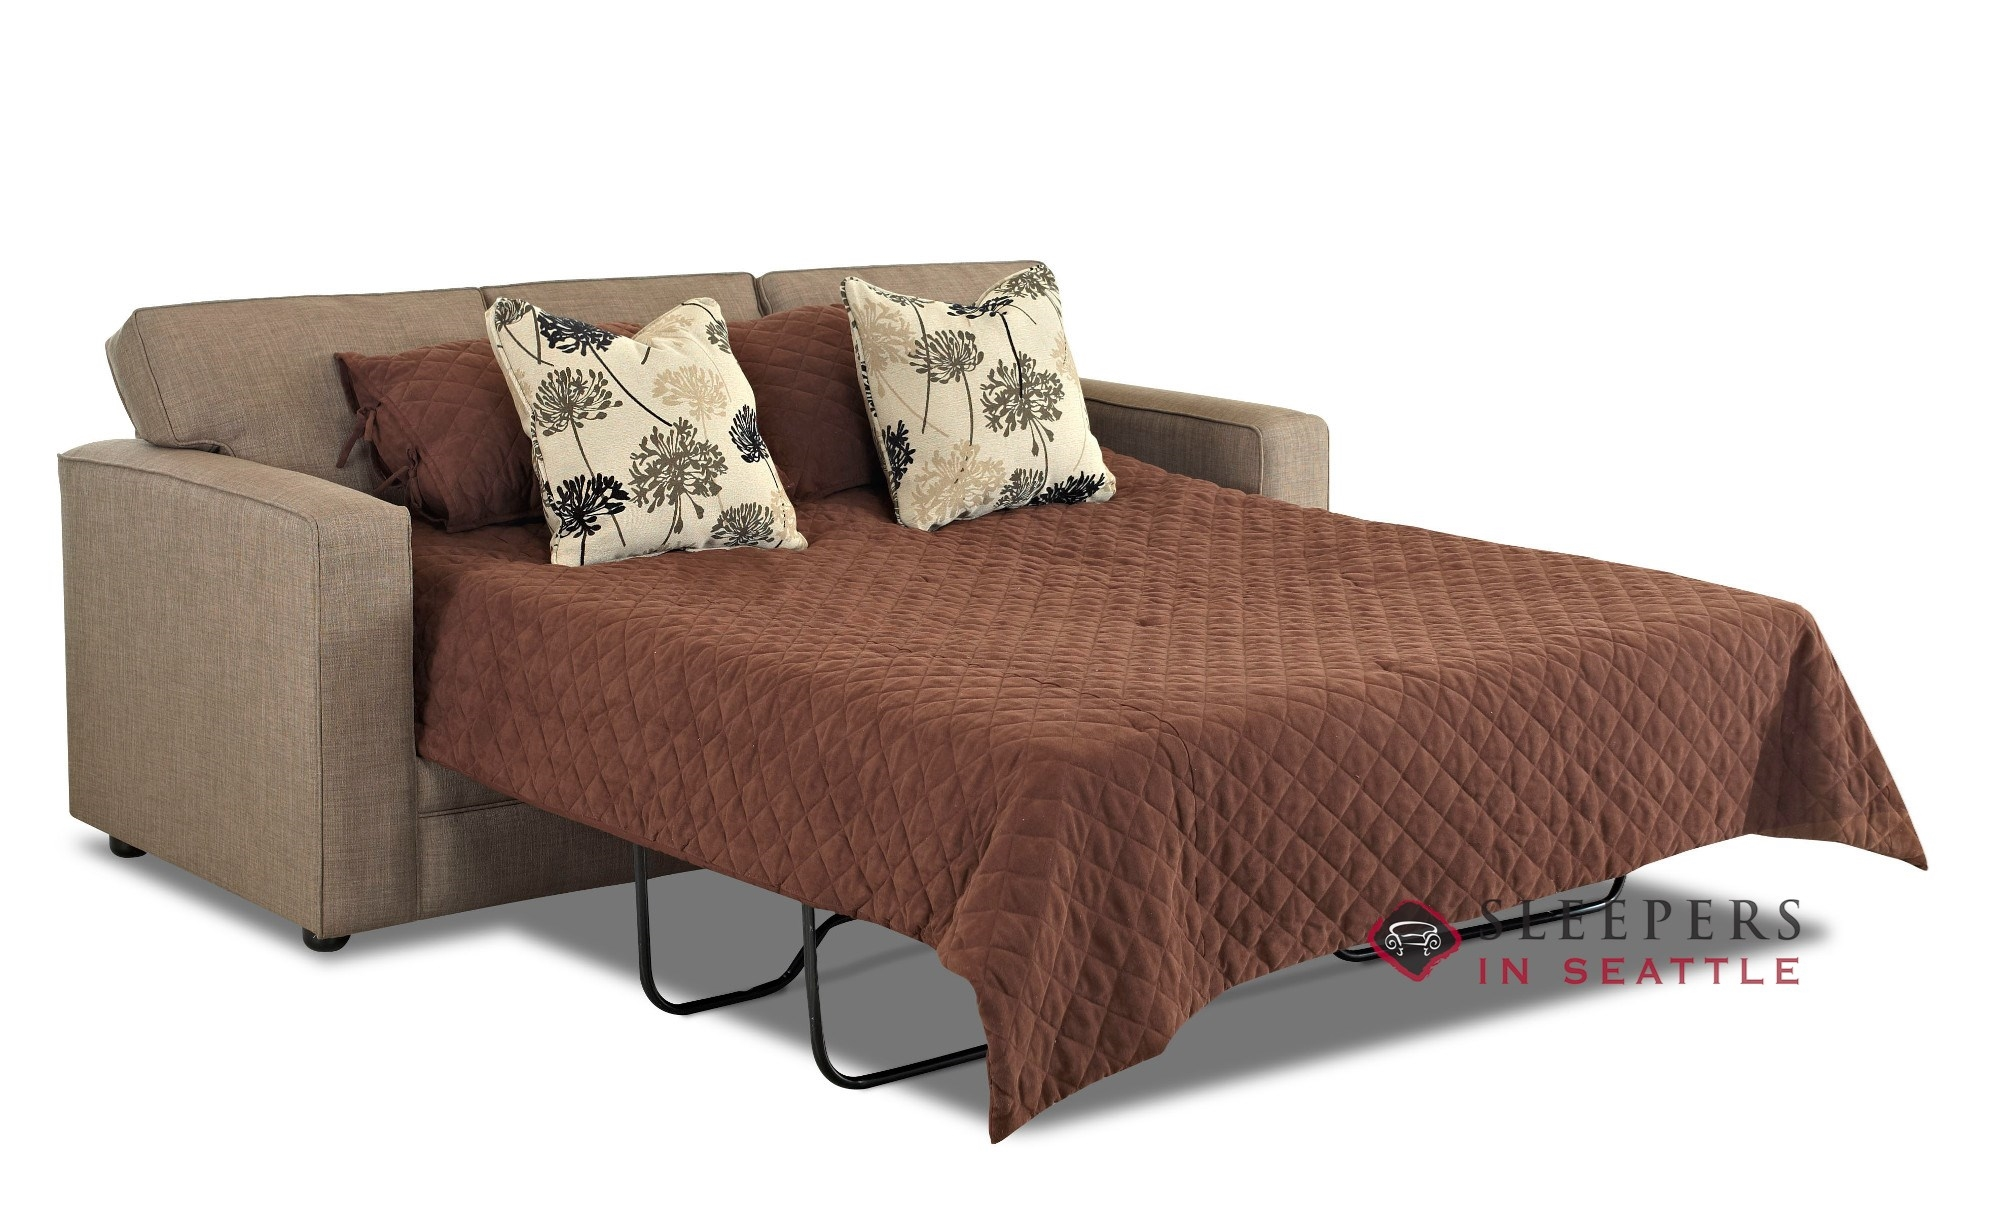 Boston Sleeper Bed Extended Queen